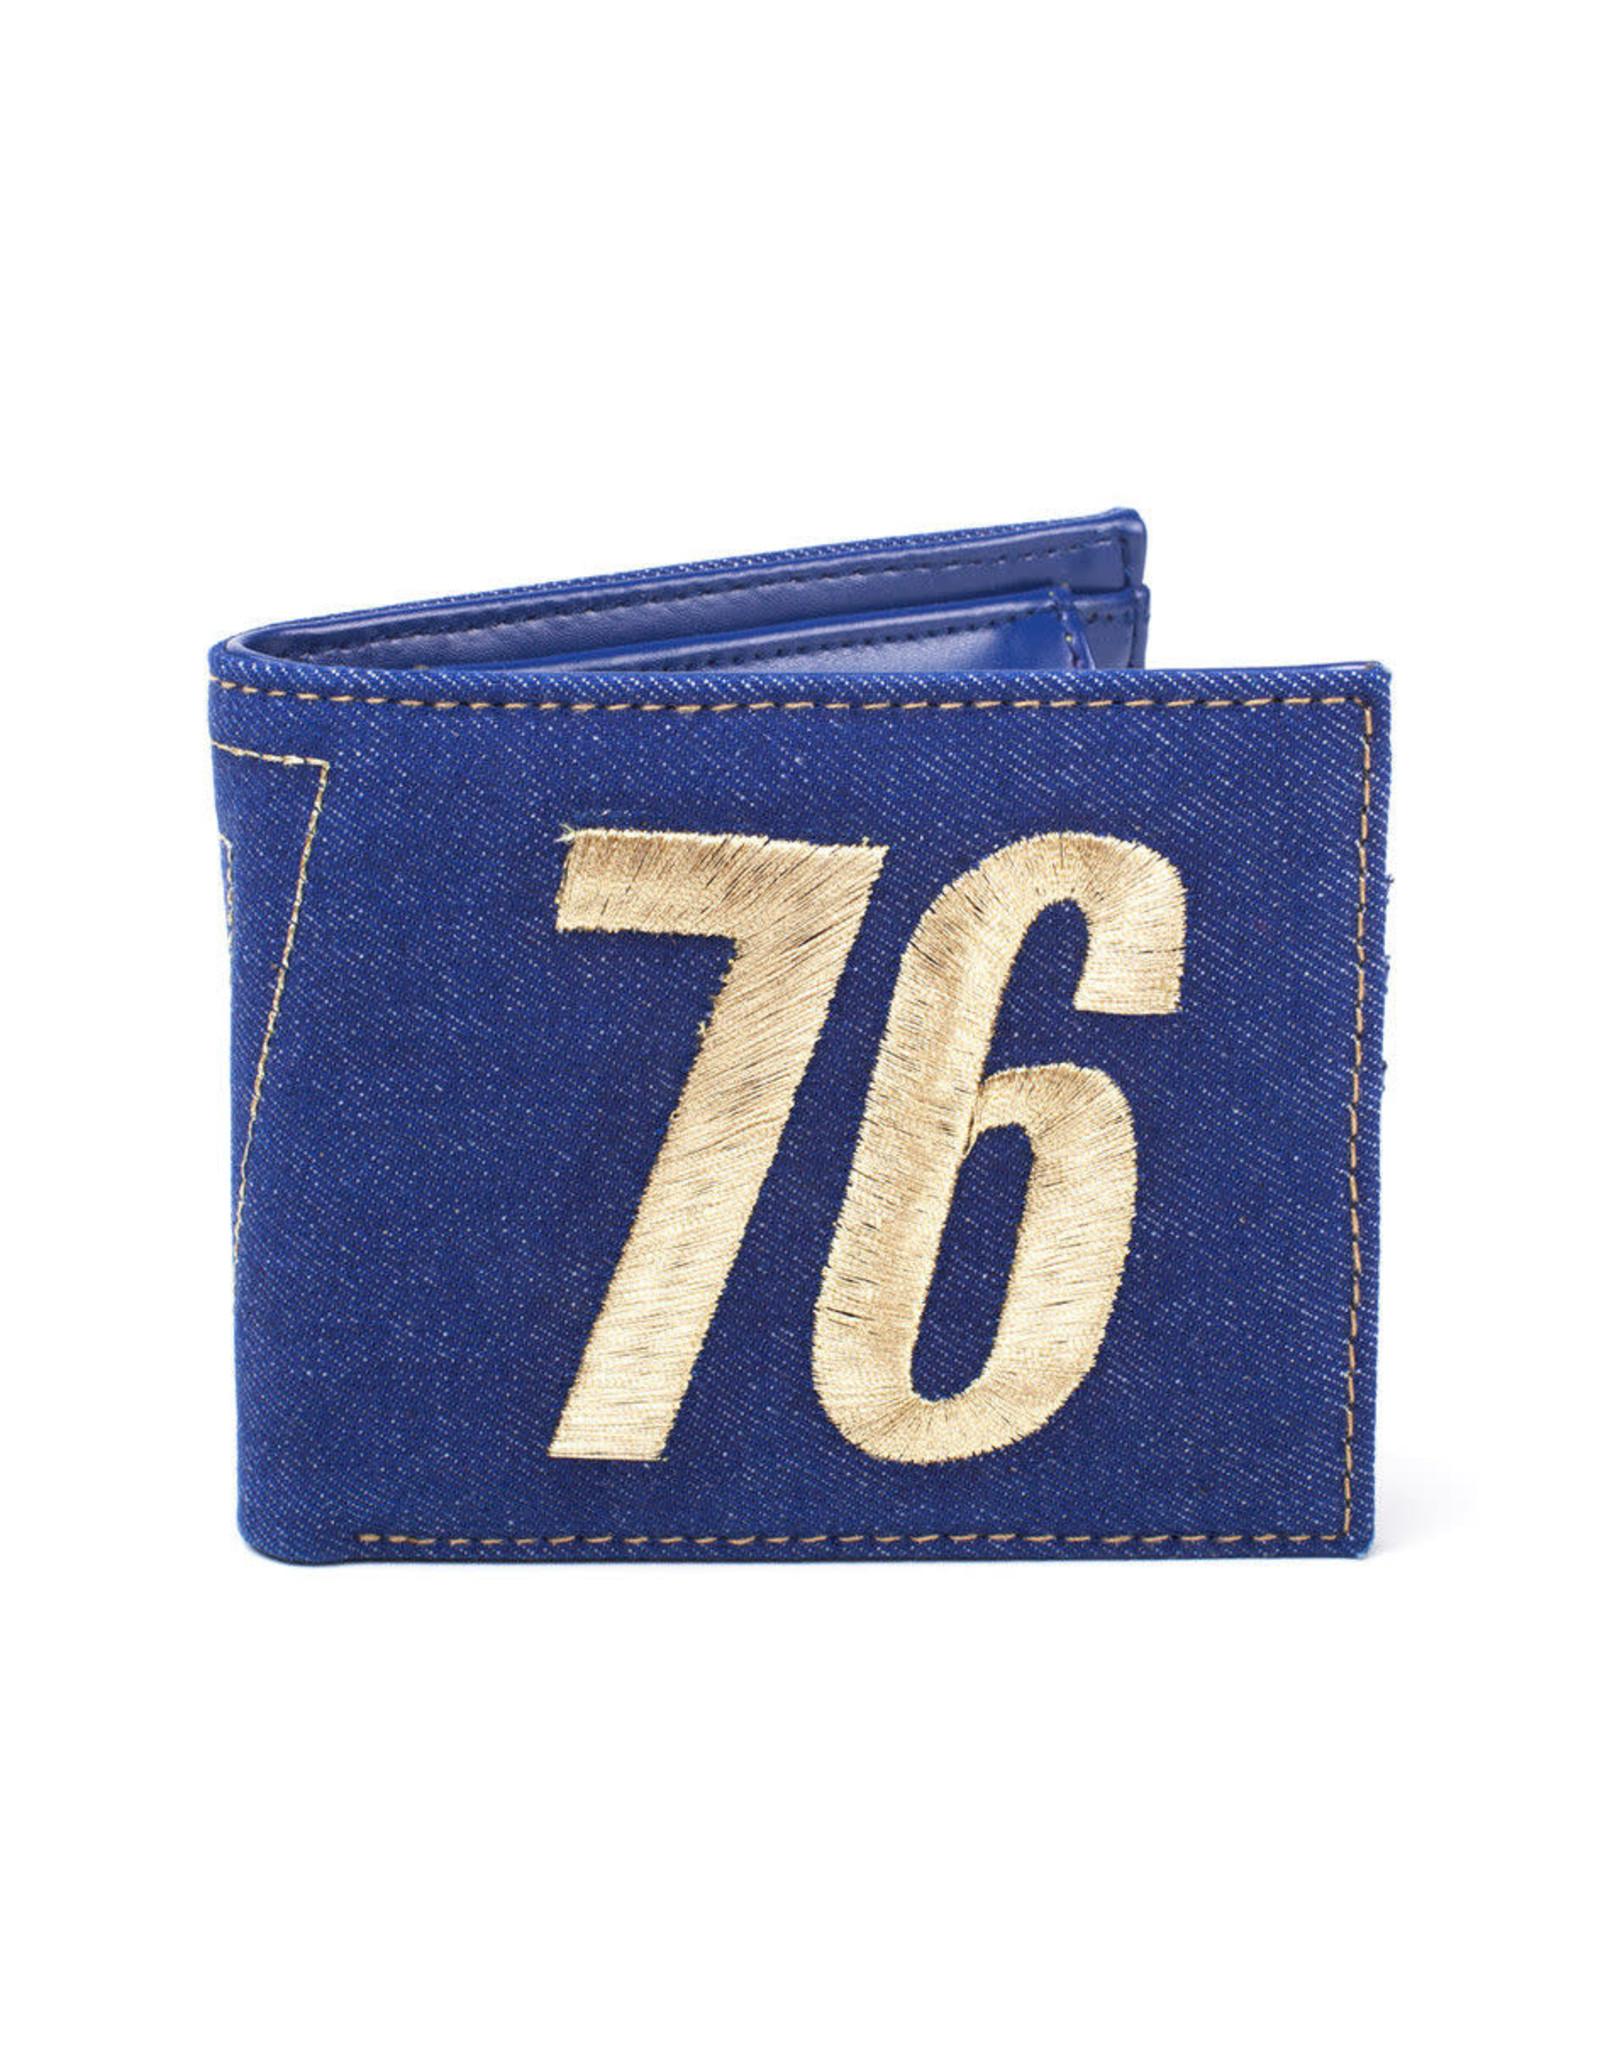 FALLOUT 76 - Vault 76 Vintage Denim Bifold Wallet